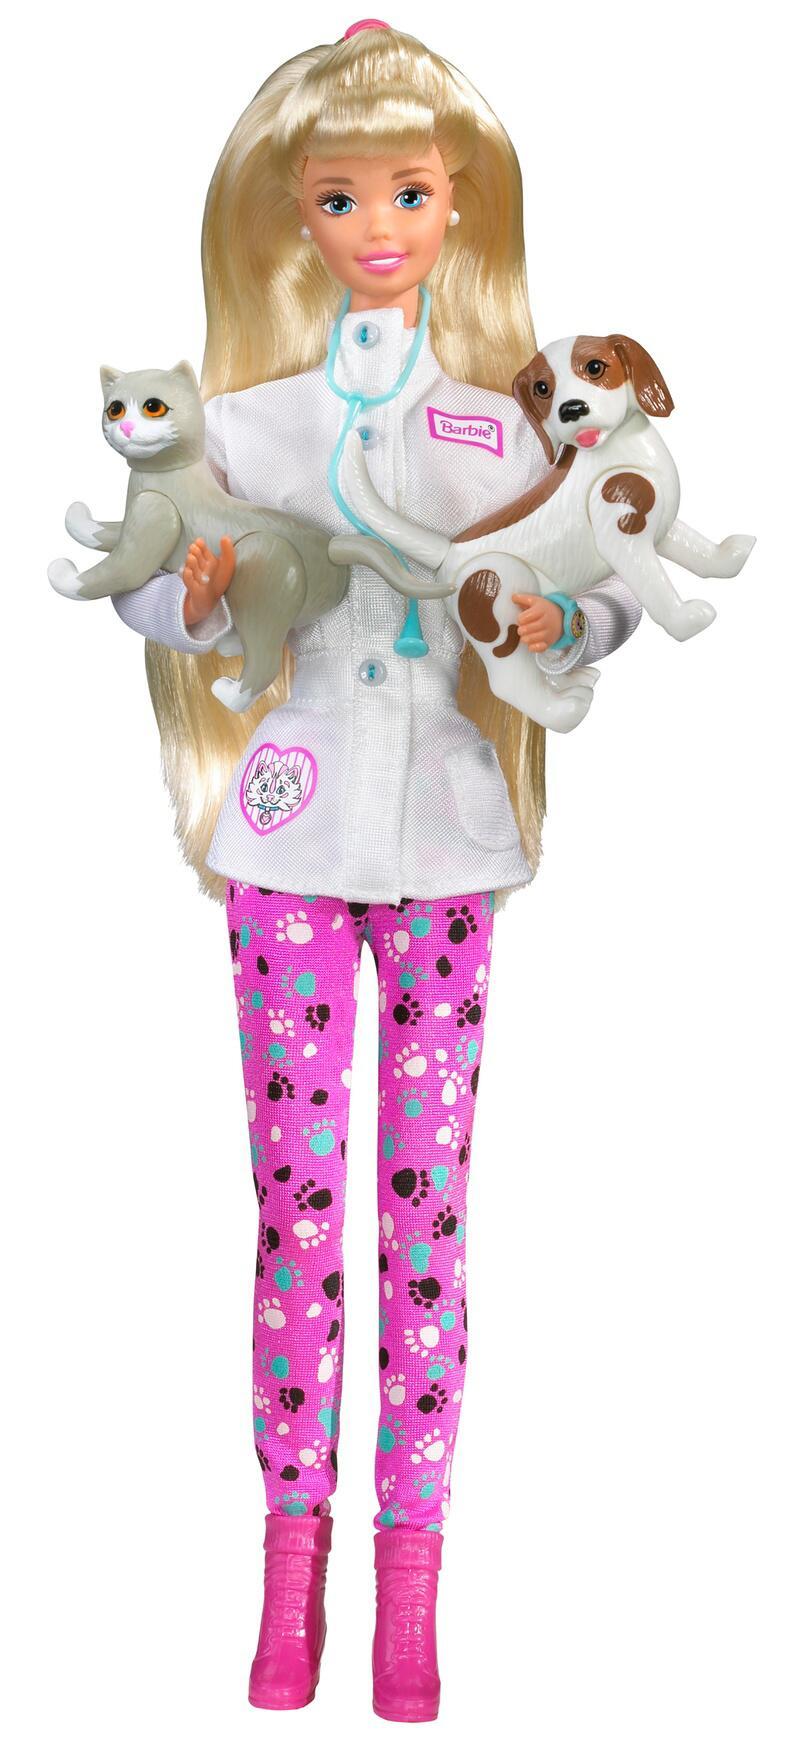 Bild zu 1985 Tierärztin - Barbie